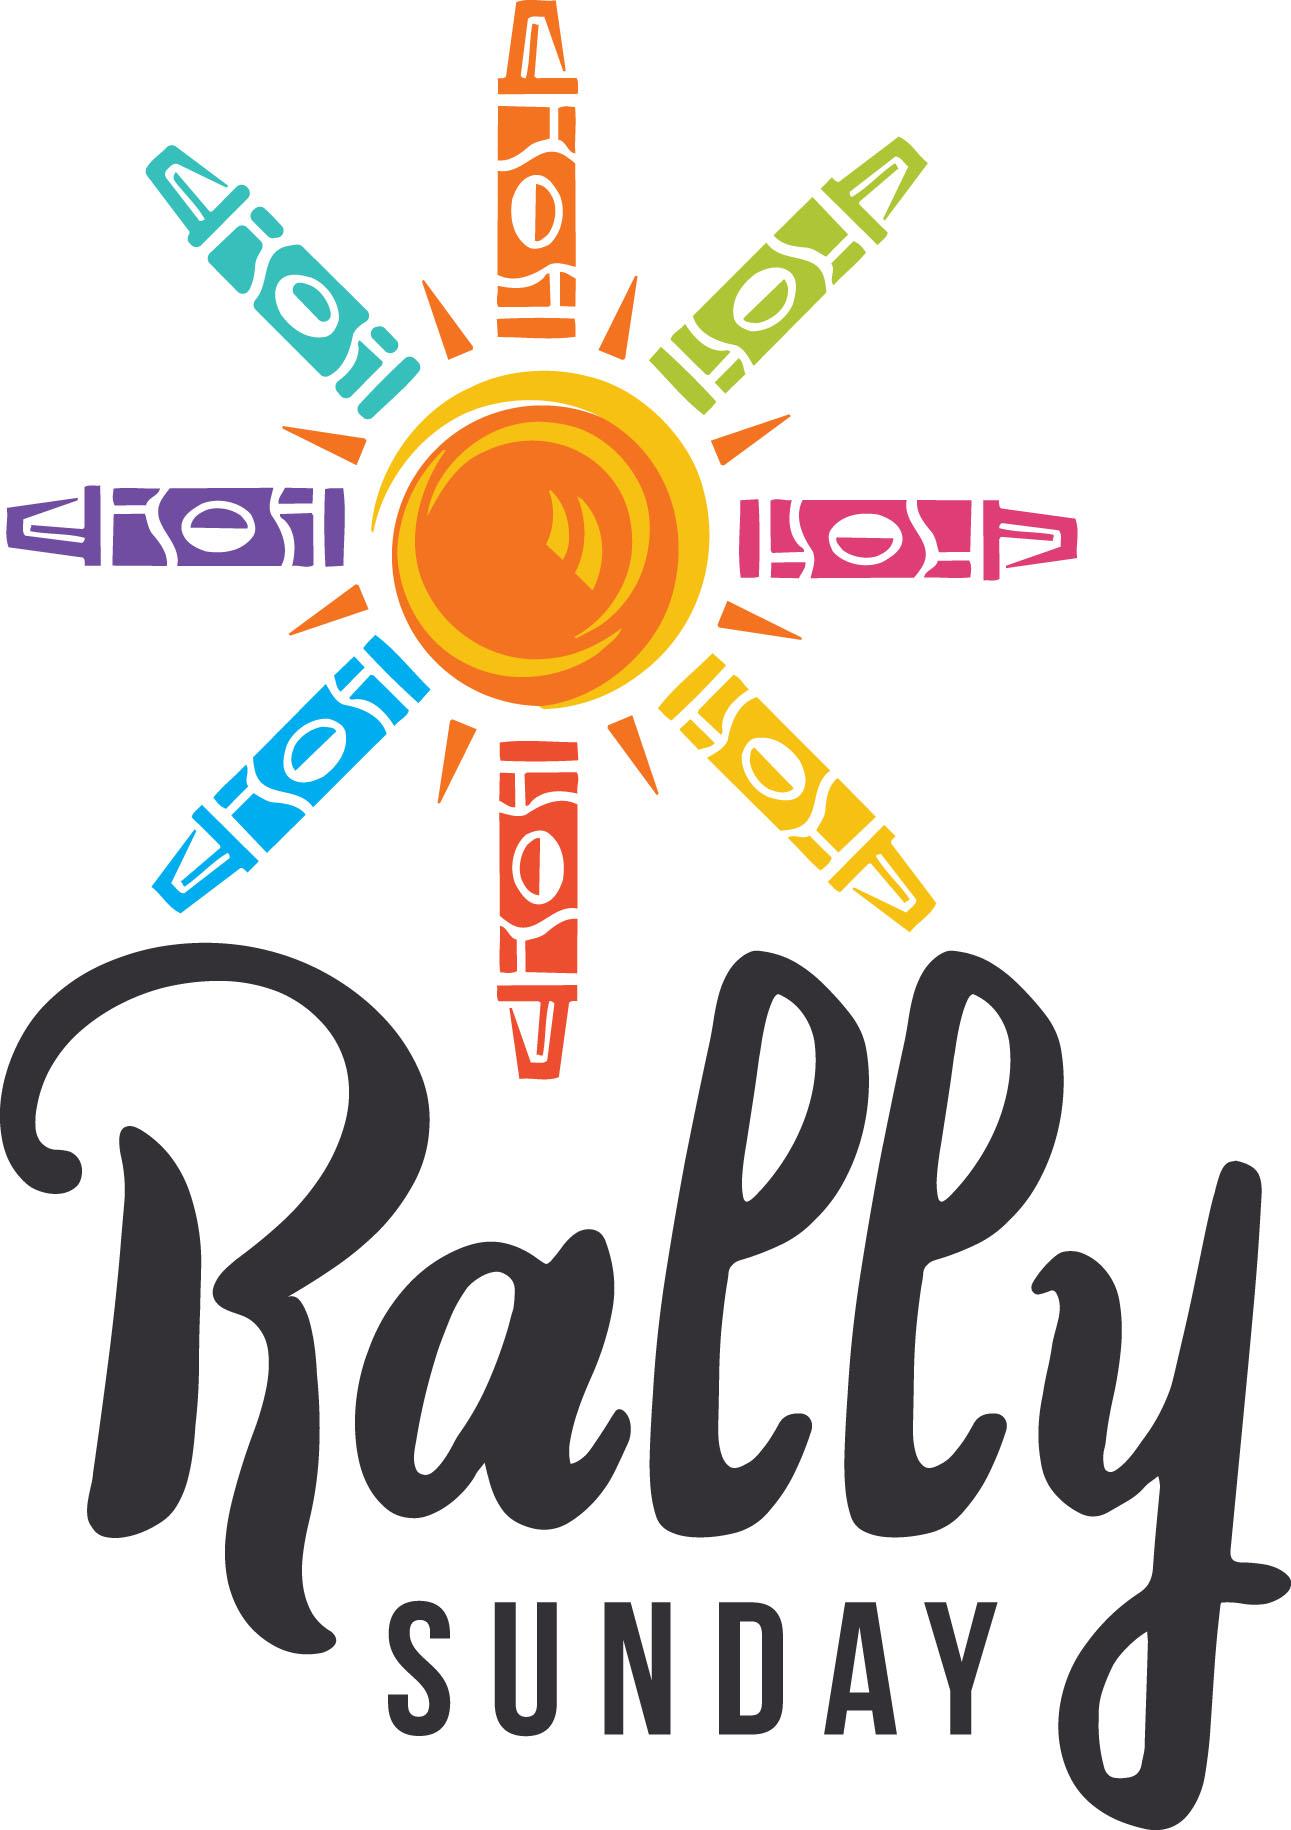 Rally Sunday 2017 Our Saviour S Lutheran Church Audubon